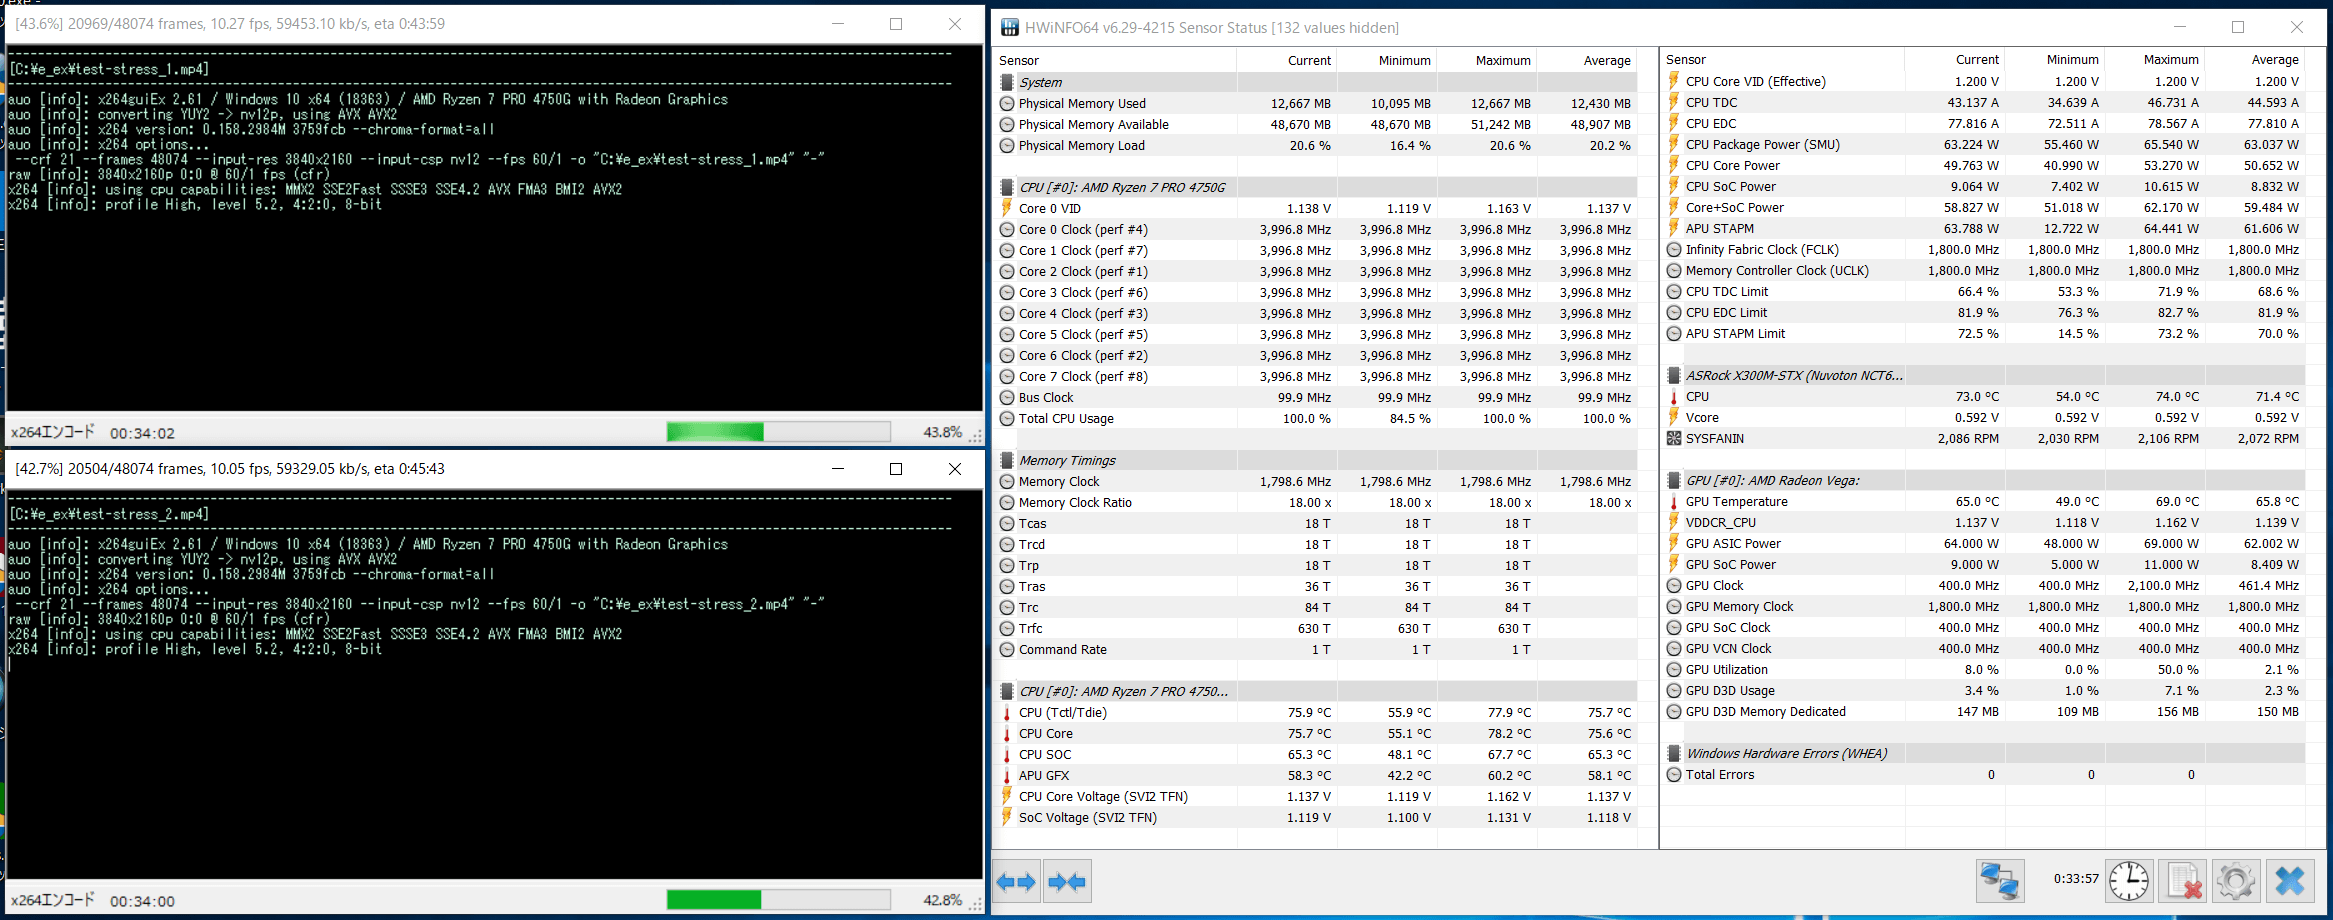 ASRock DeskMini X300_CPU-Z_Ryzen 7 PRO 4750G_temp-stress